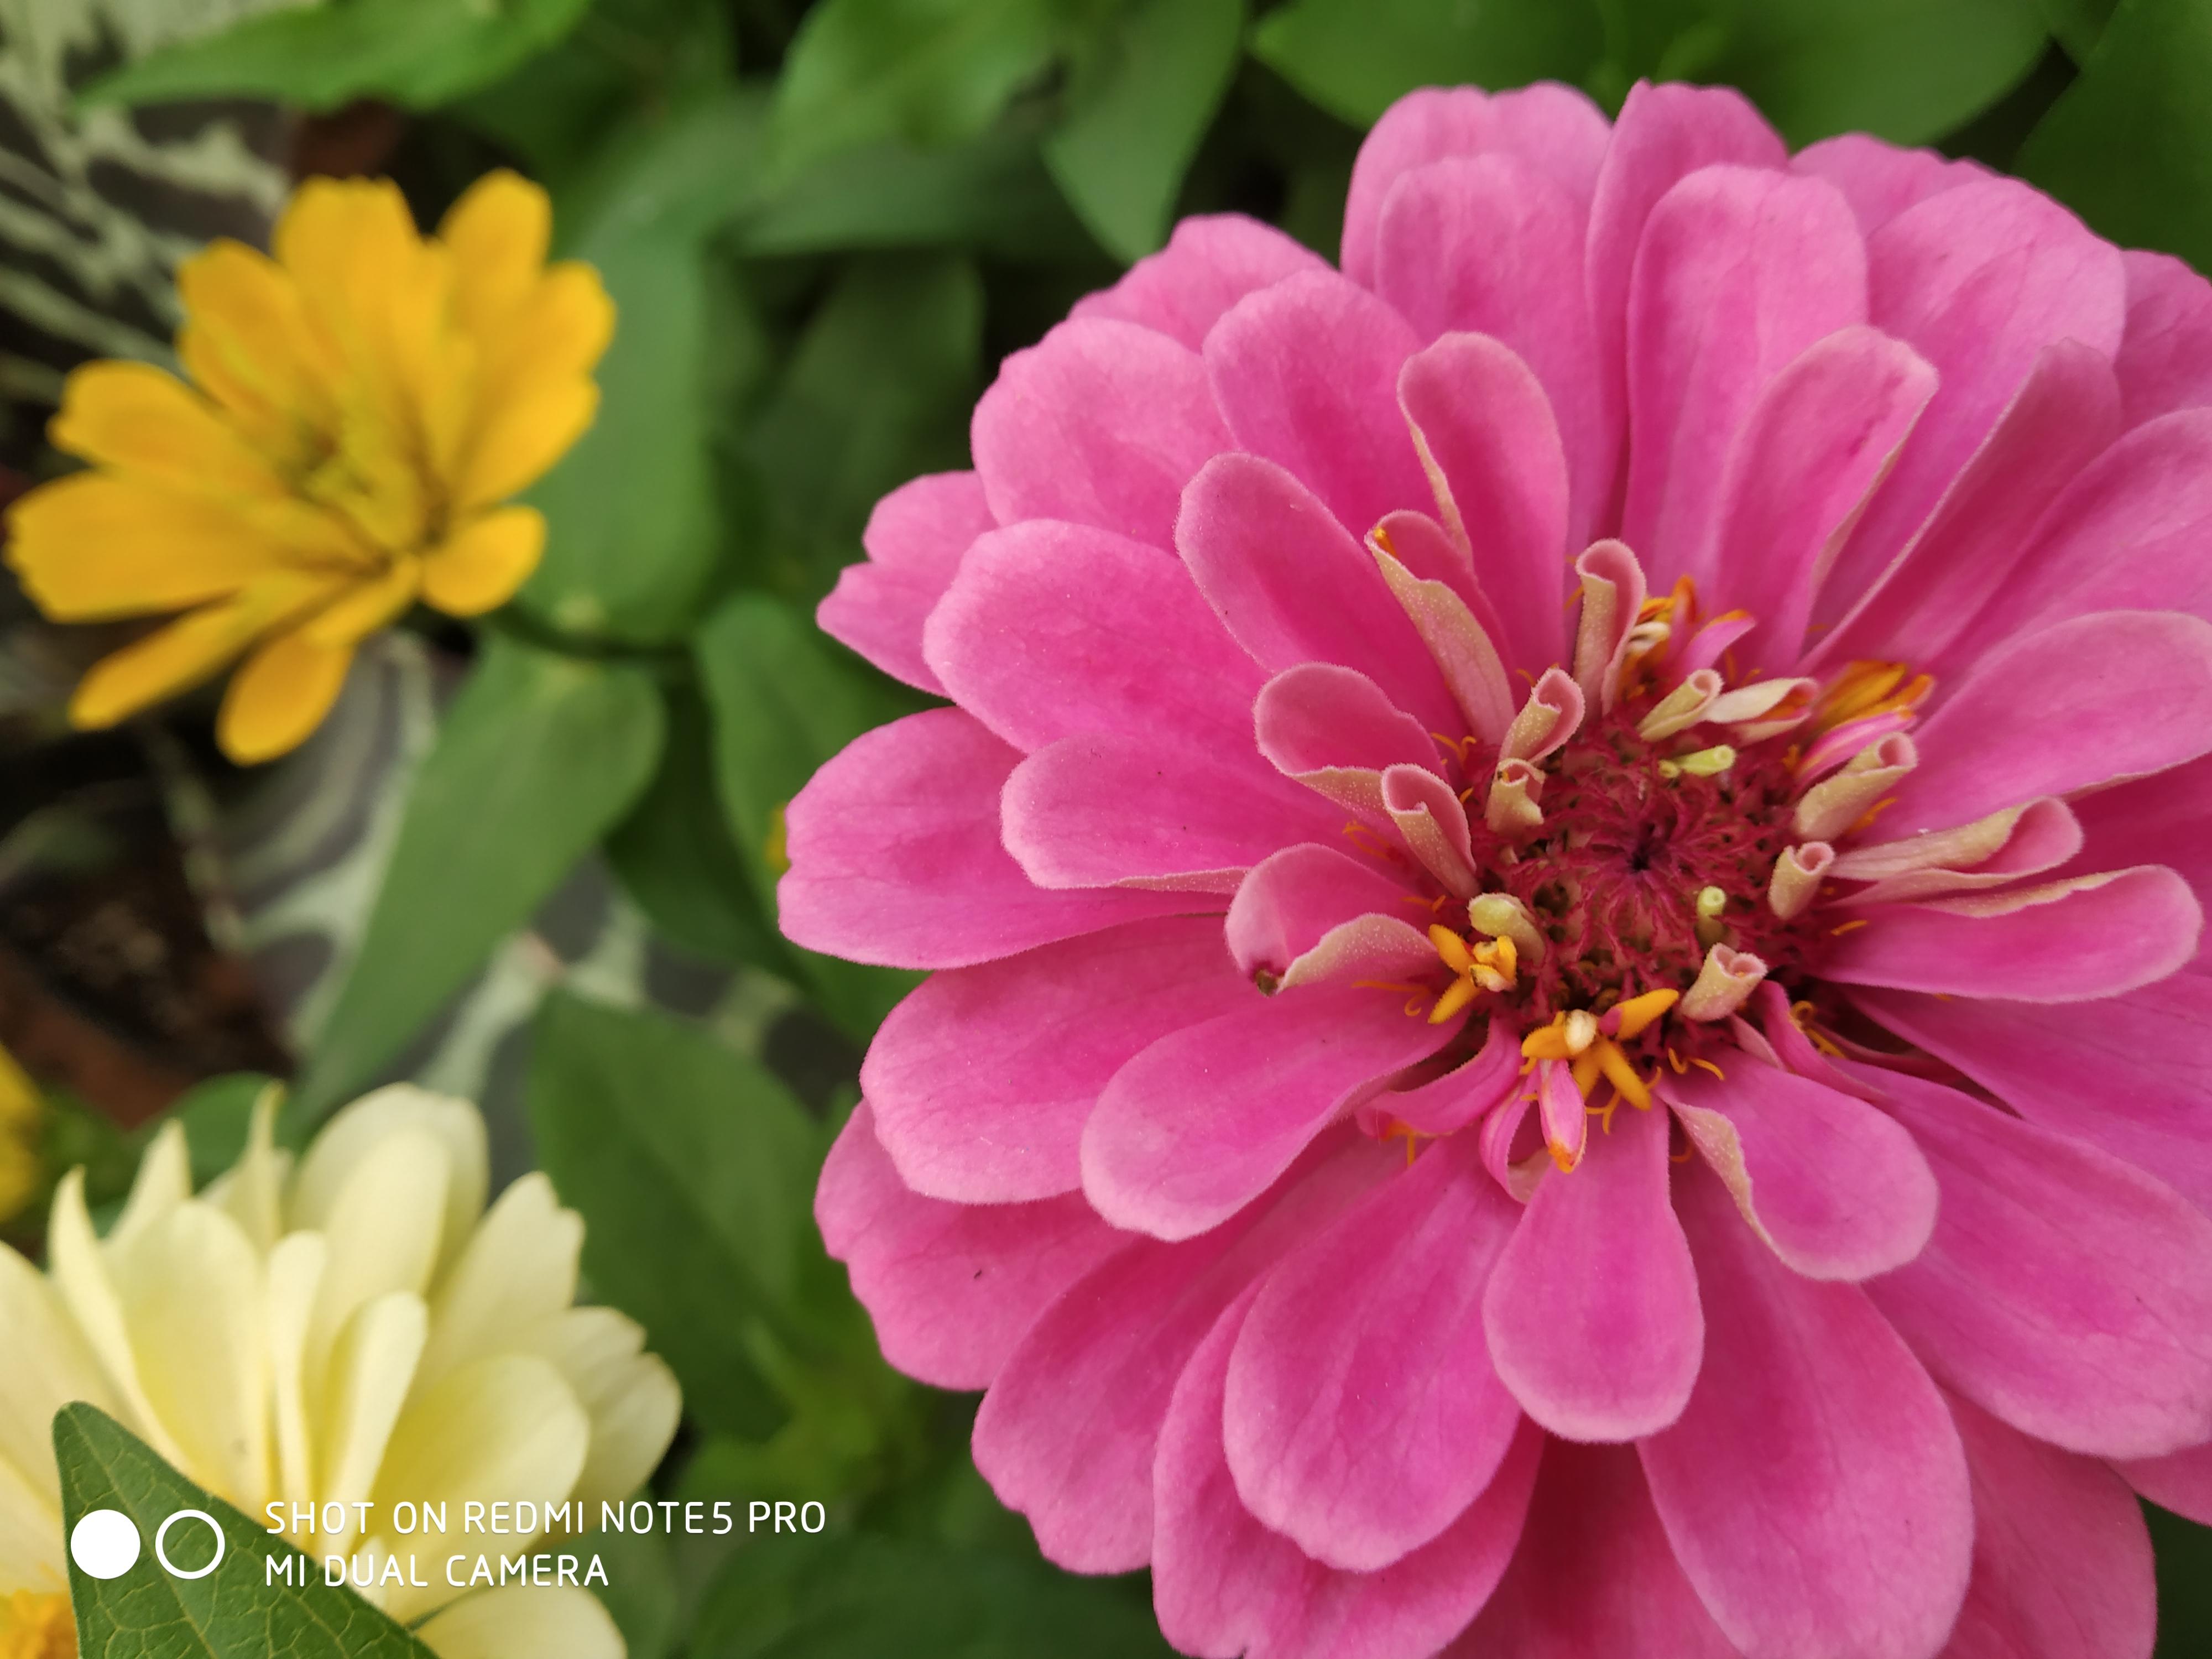 Cute Pink Flowers In This Rainy Season Photography Mi Community